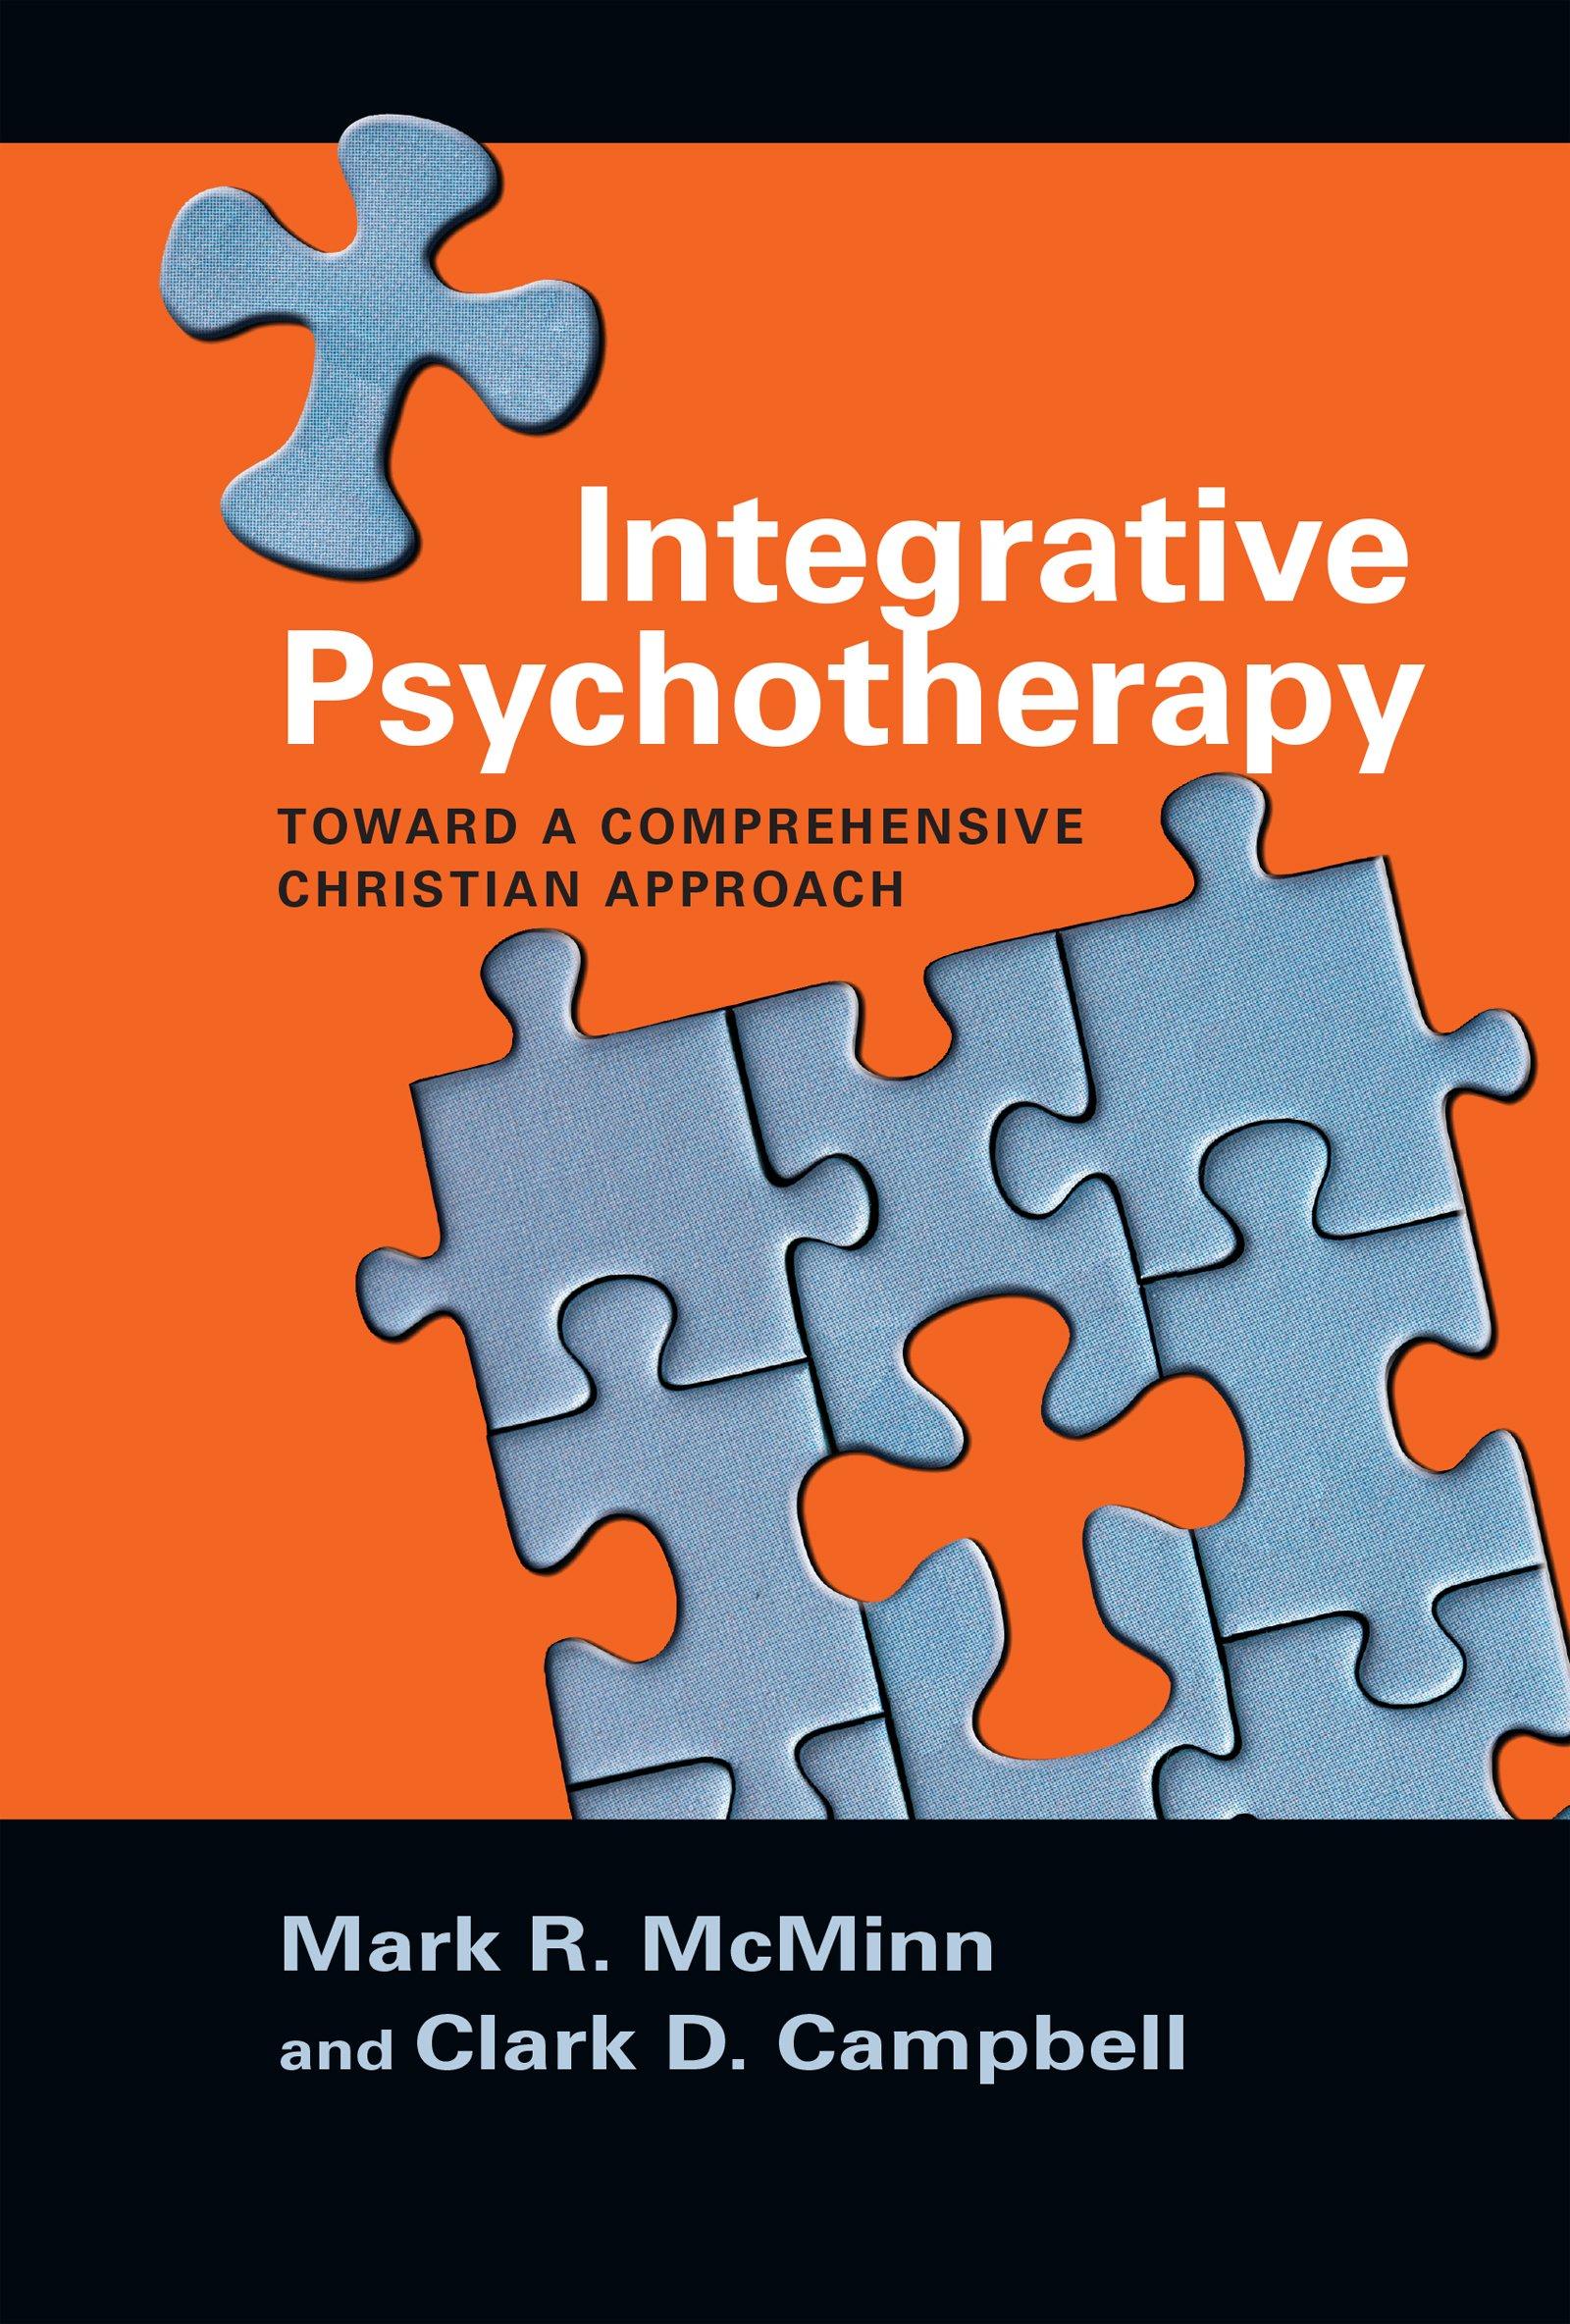 Integrative Psychotherapy: Toward a Comprehensive Christian Approach  (Christian Association for Psychological Studies Books): Mark R. McMinn, ...